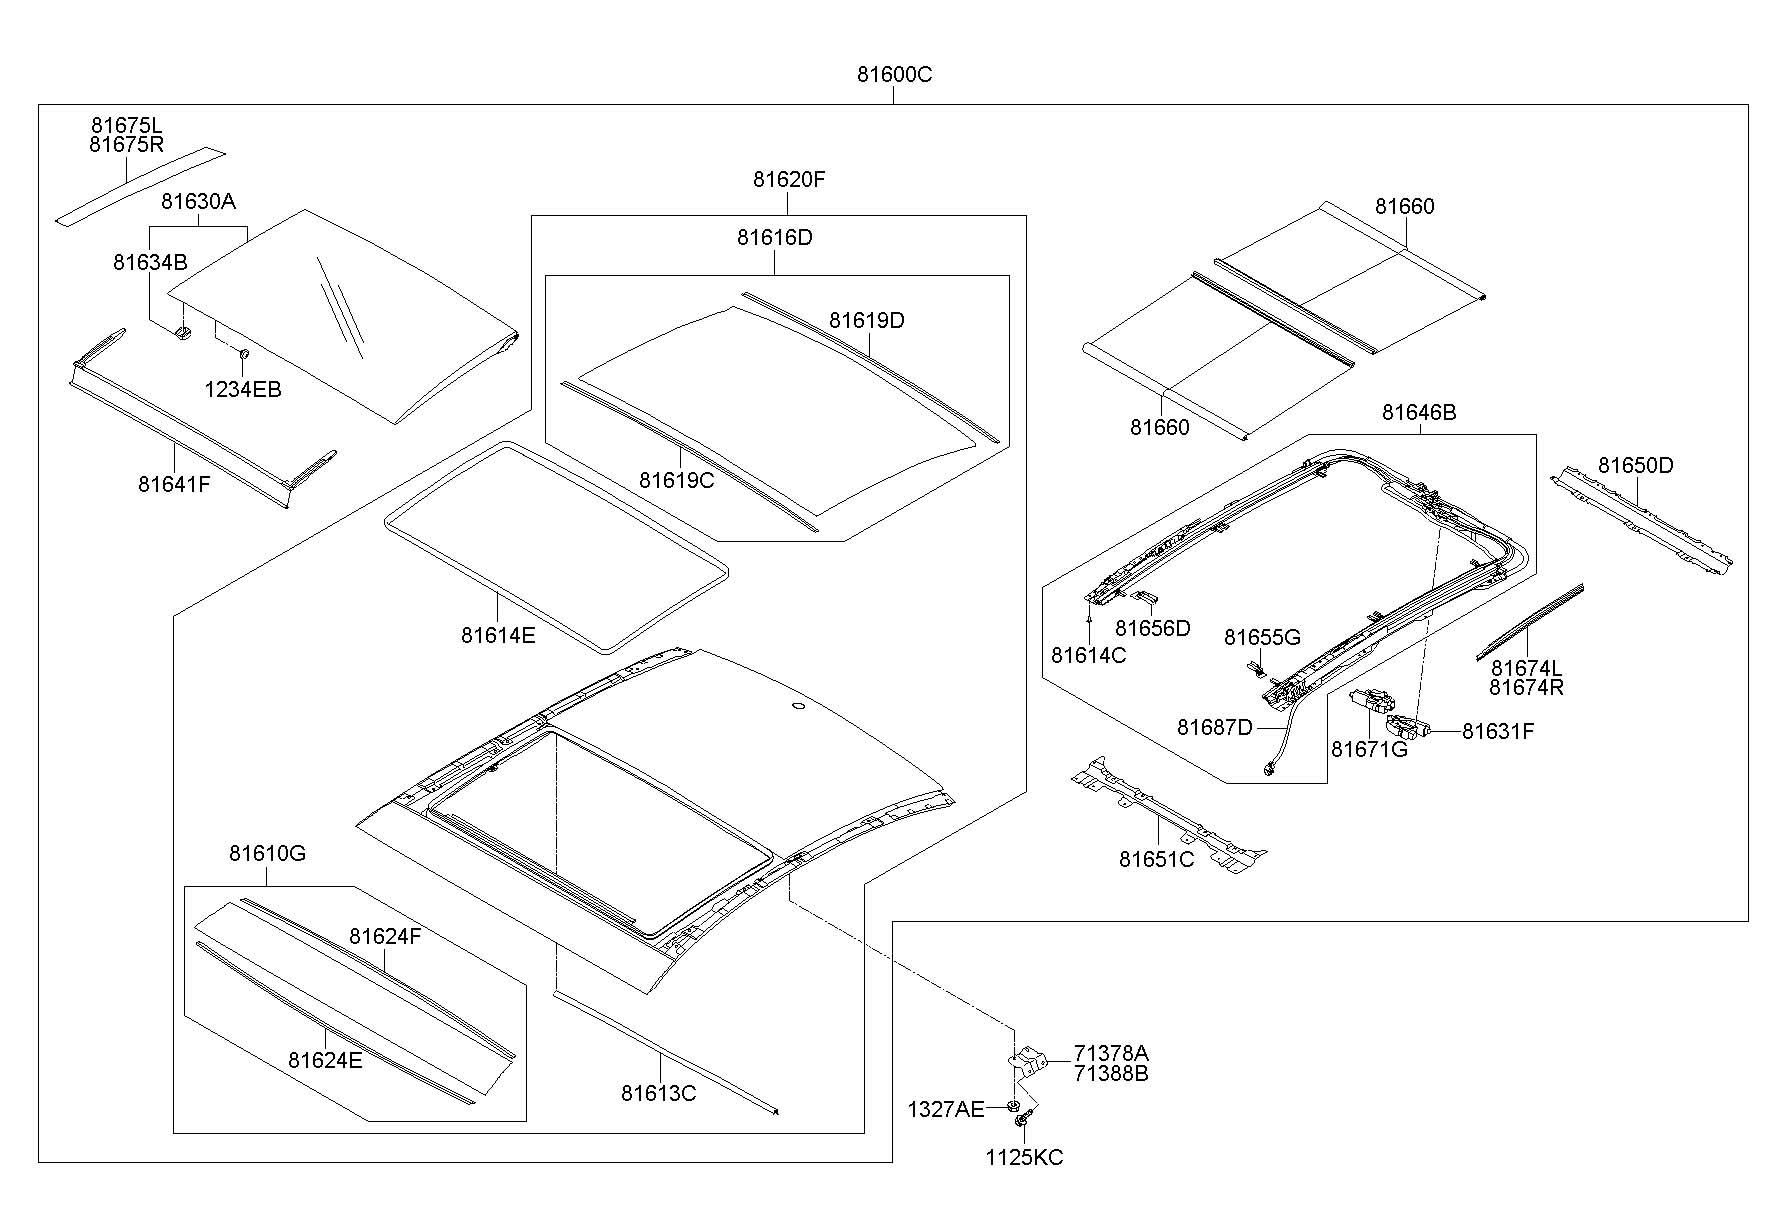 tags: #2004 hyundai elantra gls#2007 hyundai elantra parts diagram#1999  hyundai elantra parts diagram#2001 hyundai elantra engine diagram#2013  hyundai